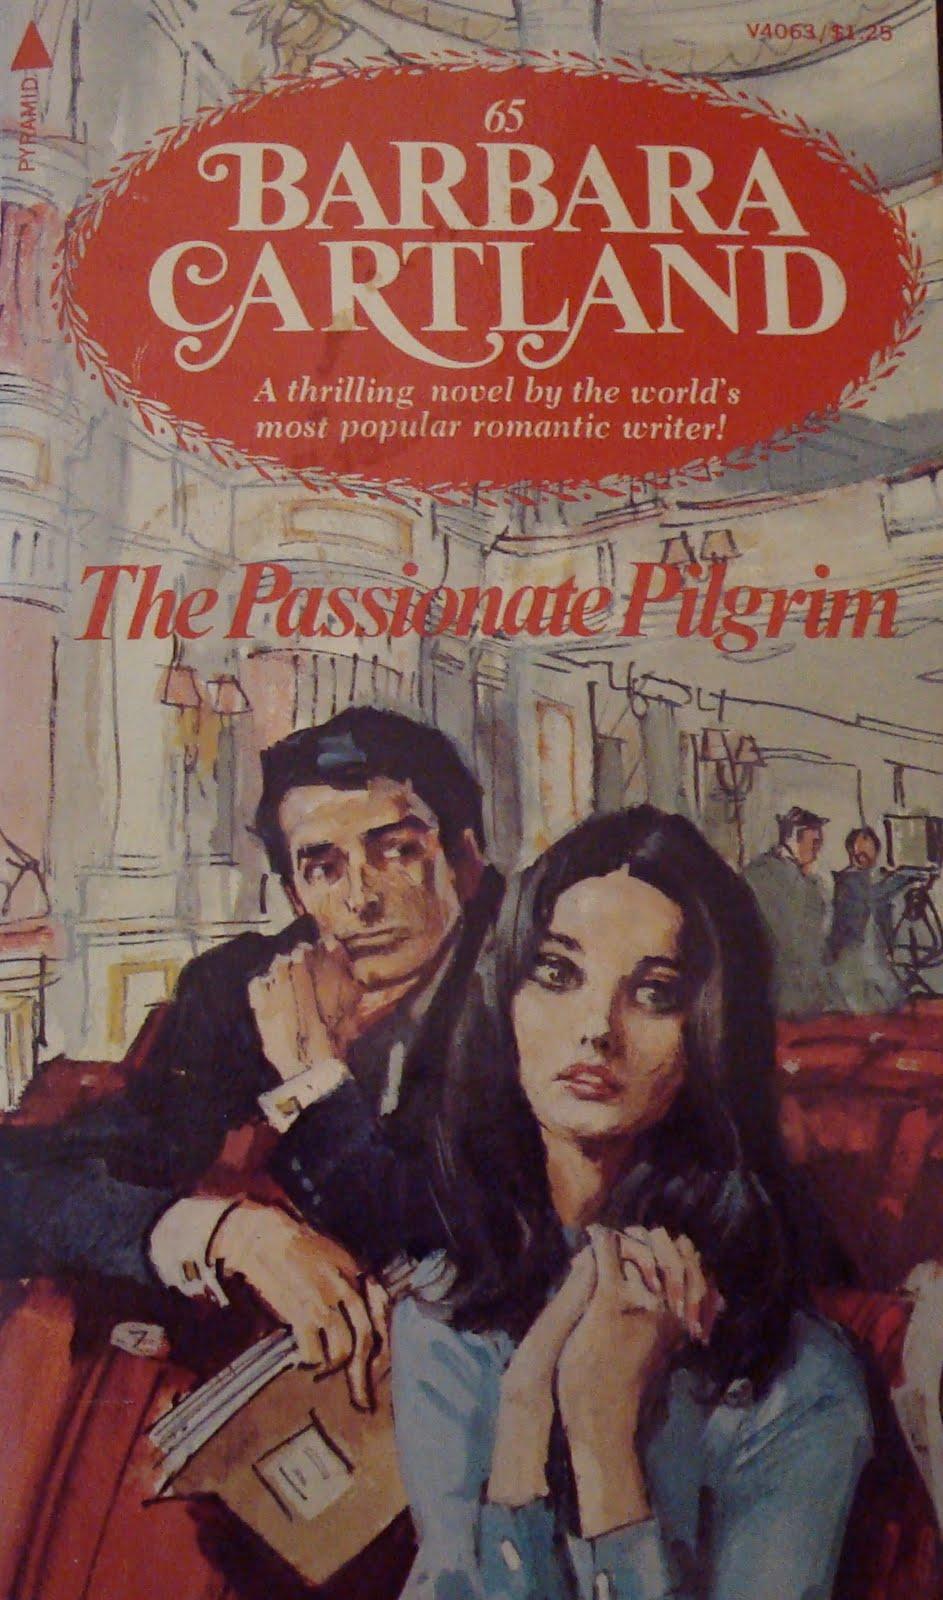 Romance Book Covers Tumblr : Barbara cartland tumblr